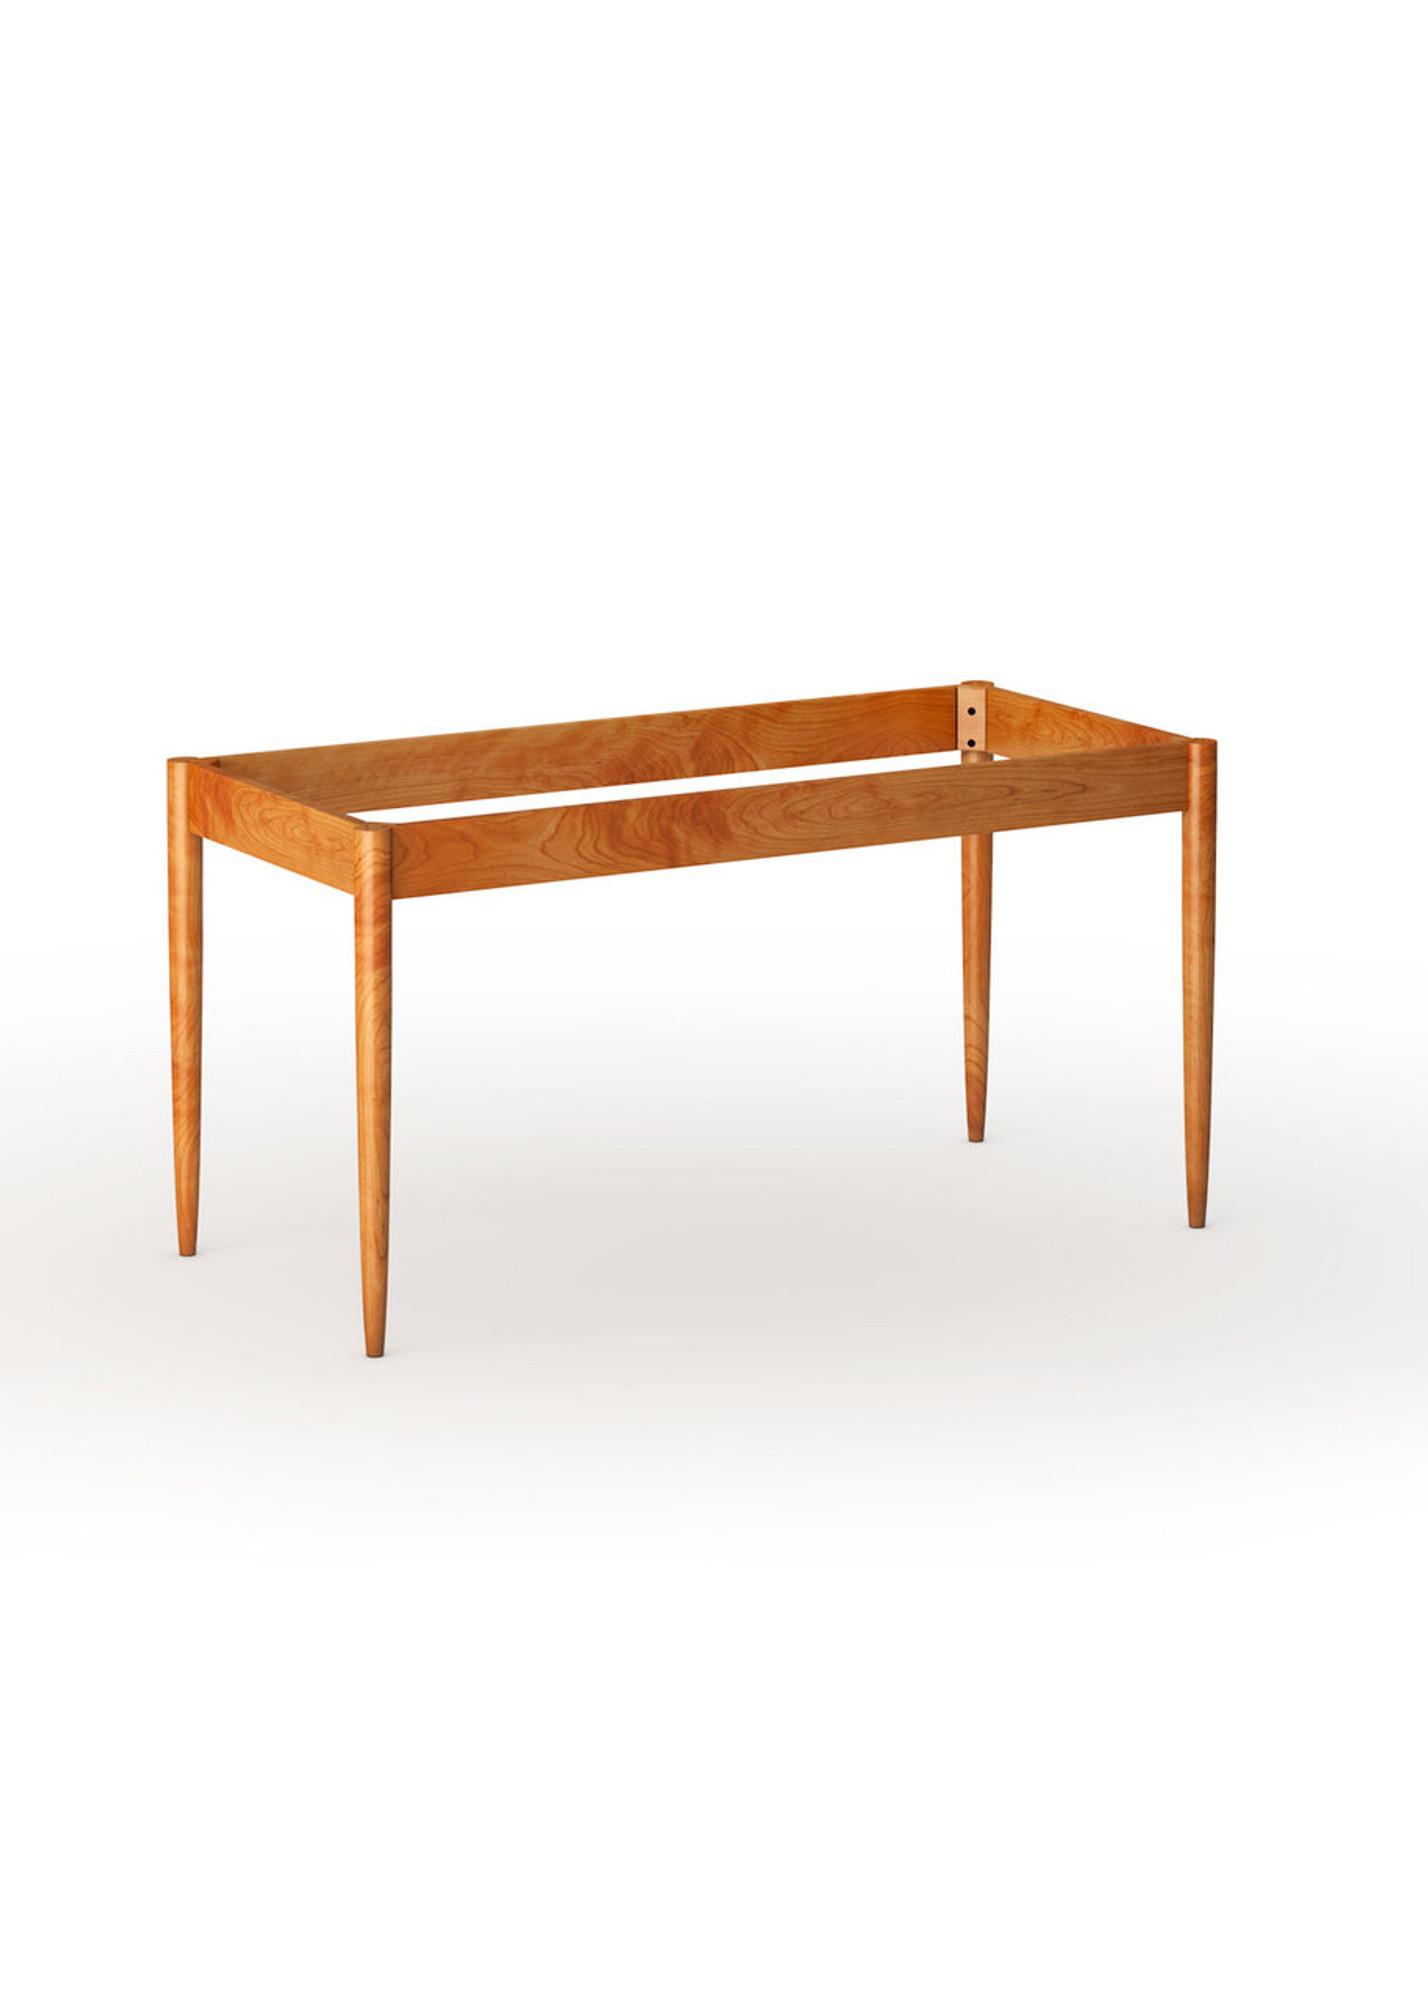 Wegner danish modern dining table base with aprons 29 leg